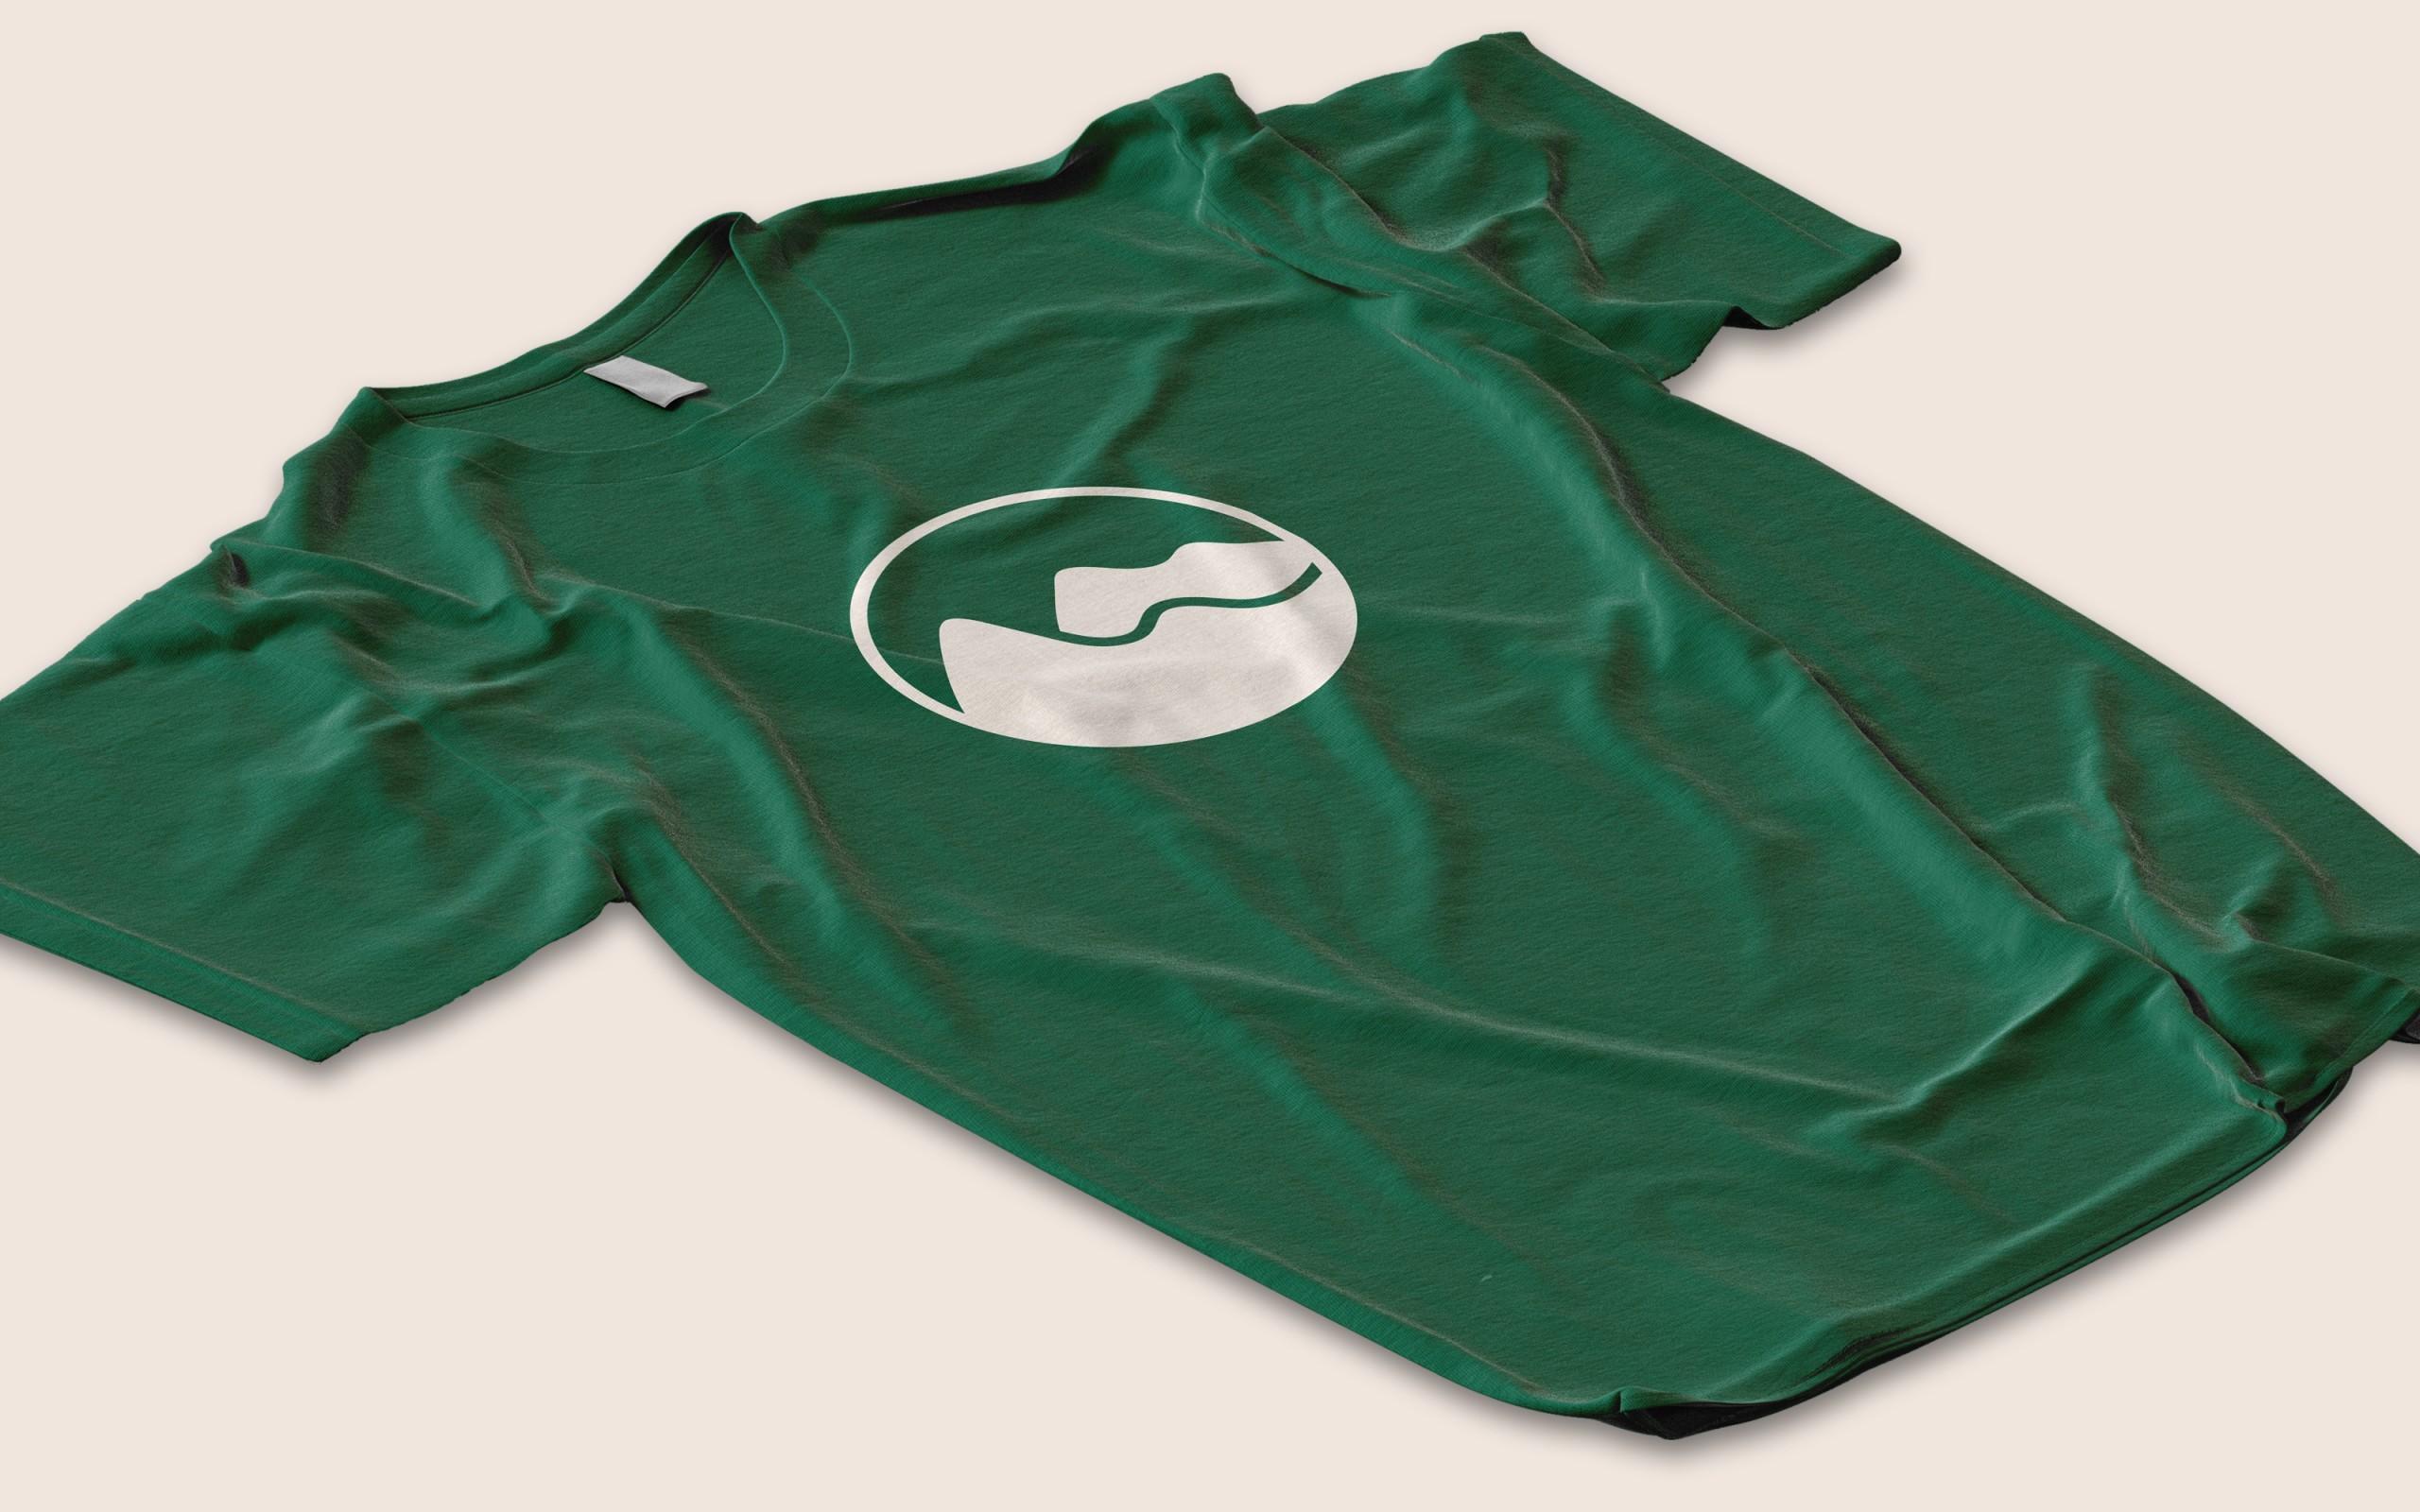 Hitchweb mountain iconography on a t-shirt.